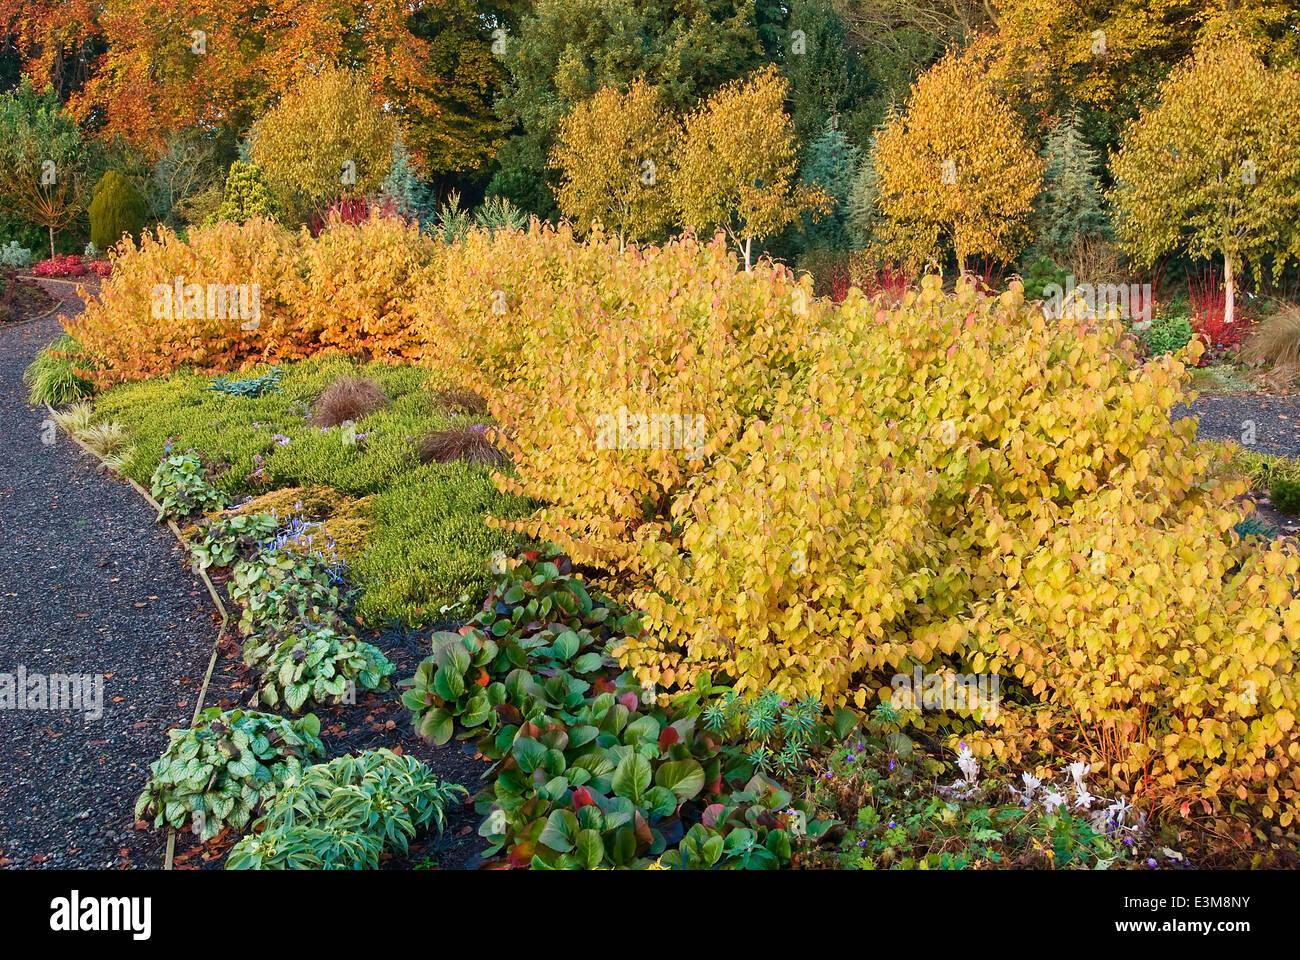 The Winter Garden in autumn. Bressingham Gardens, Norfolk, UK, Design: Adrian Bloom. Stock Photo